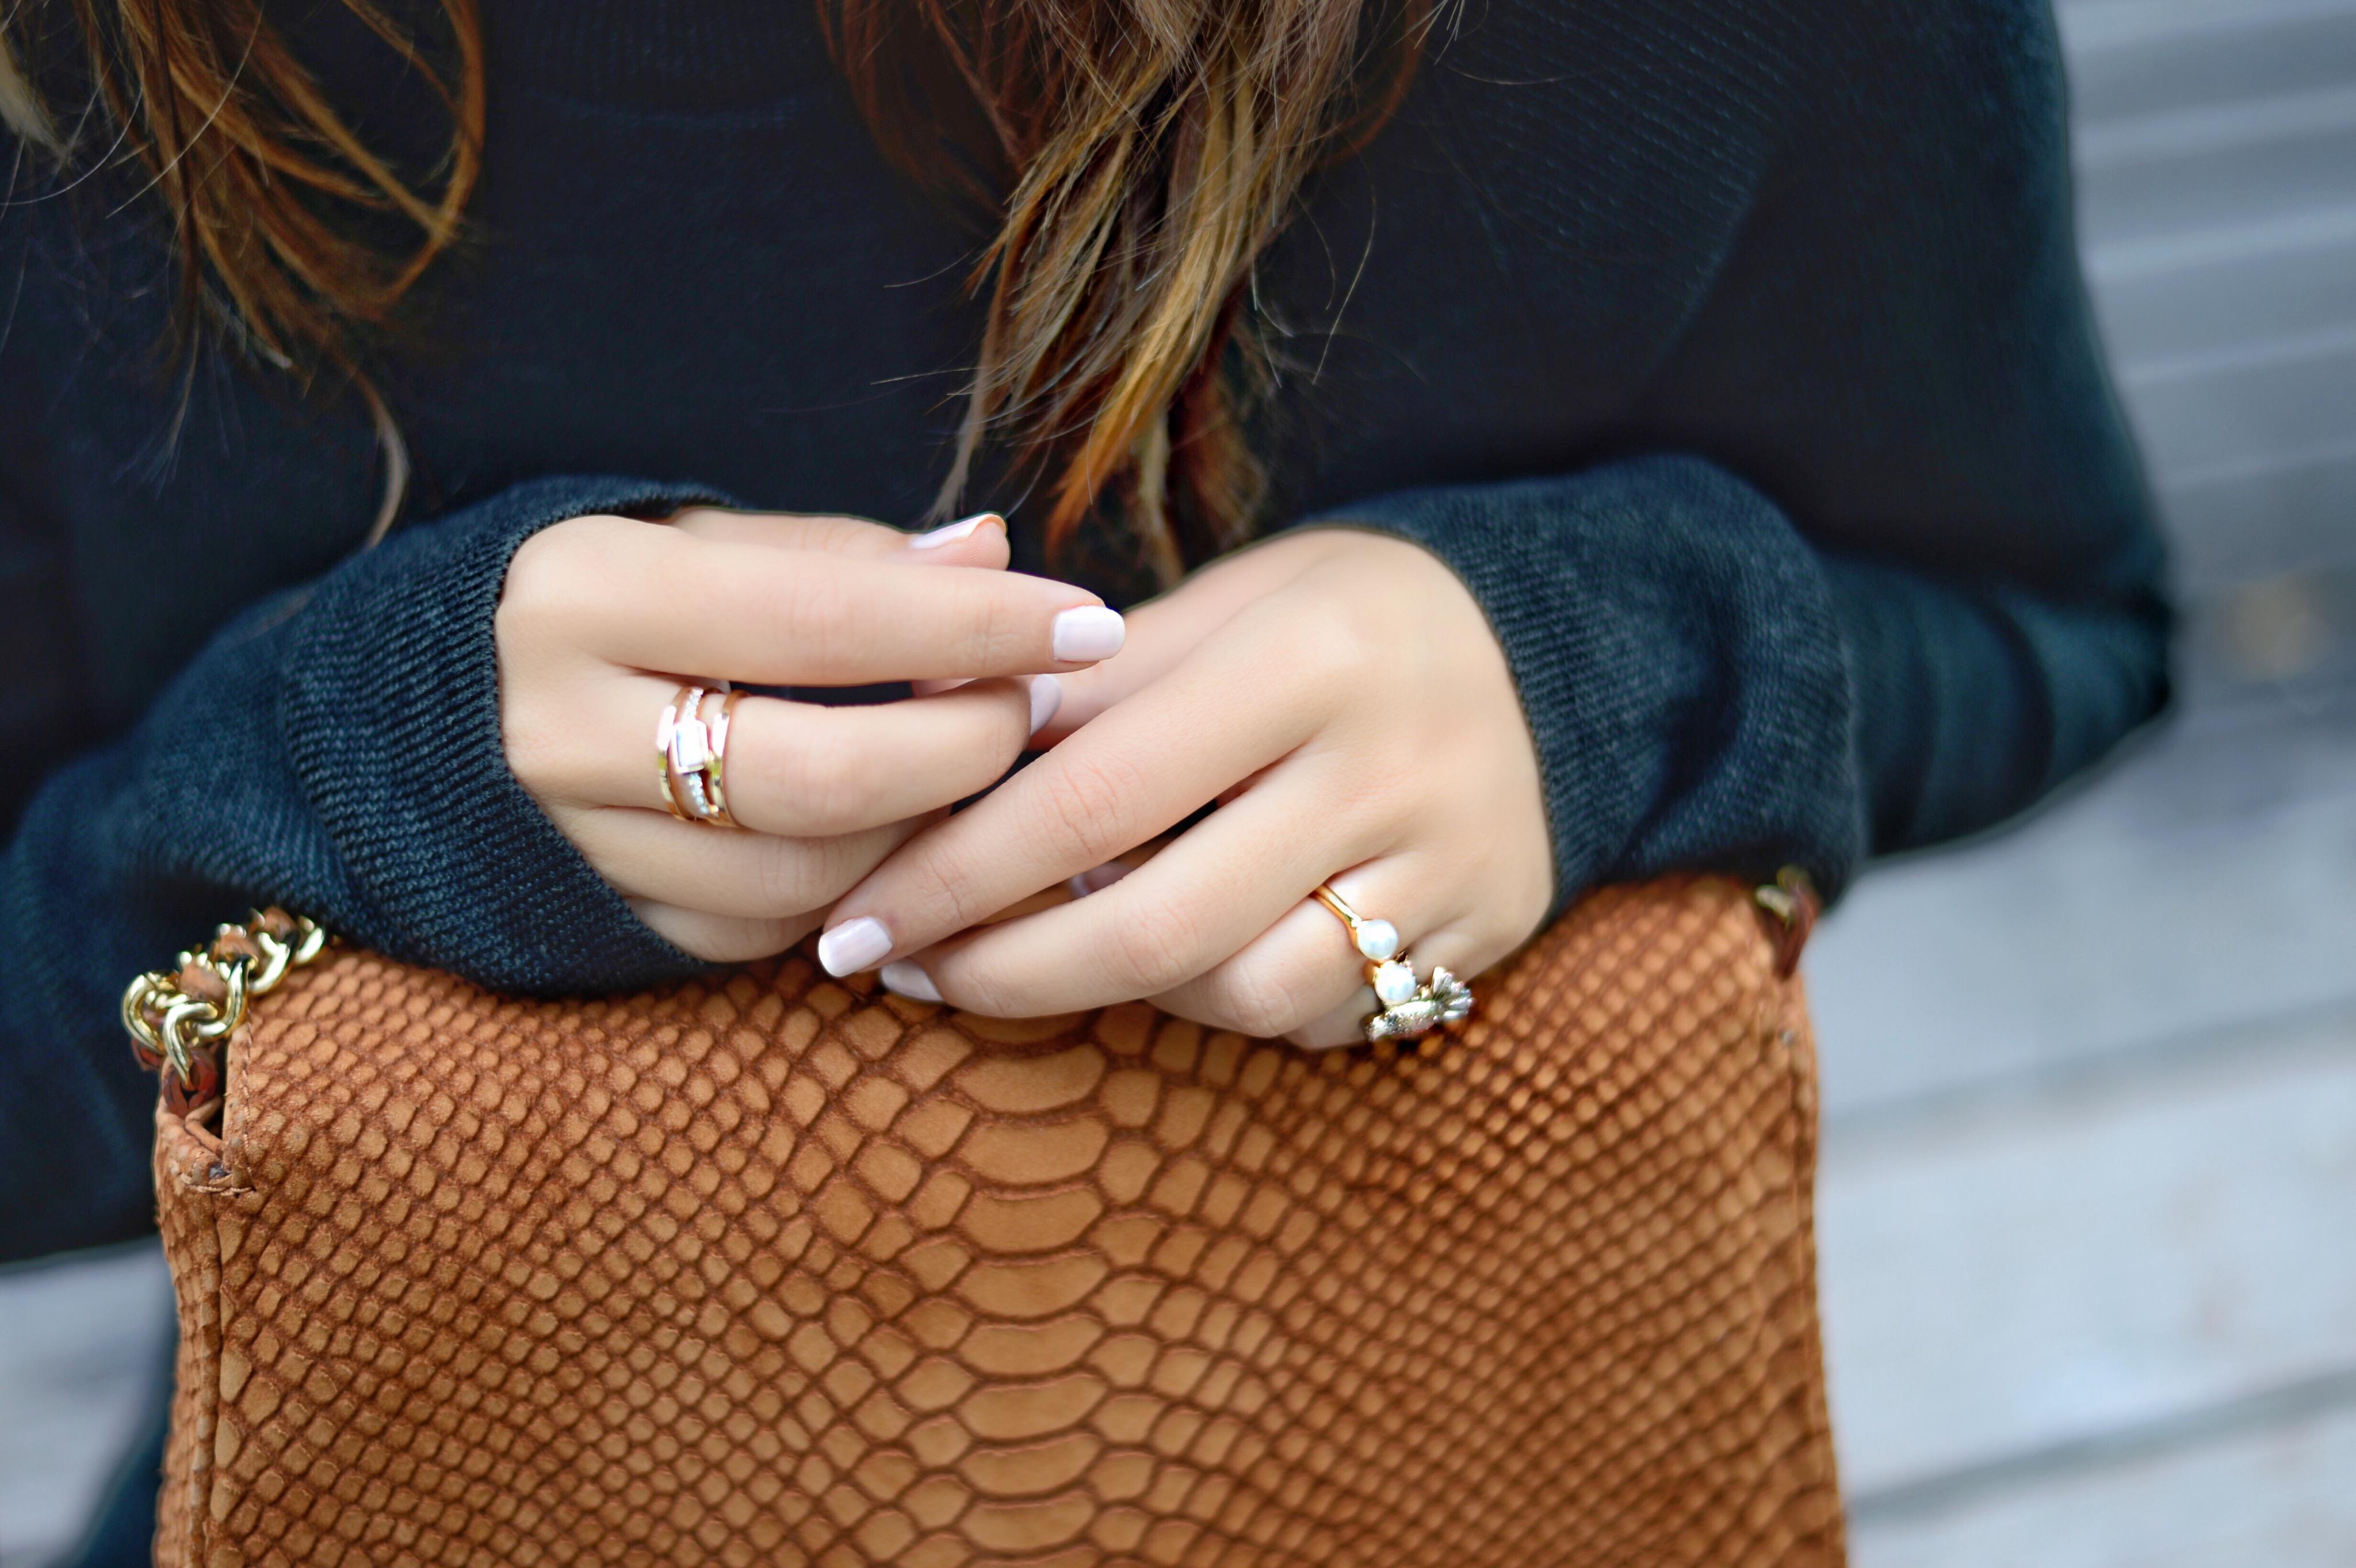 jersey-dress-gold-shoes-alley-girl-betul-yildiz-new-york-fashion-blogger-10